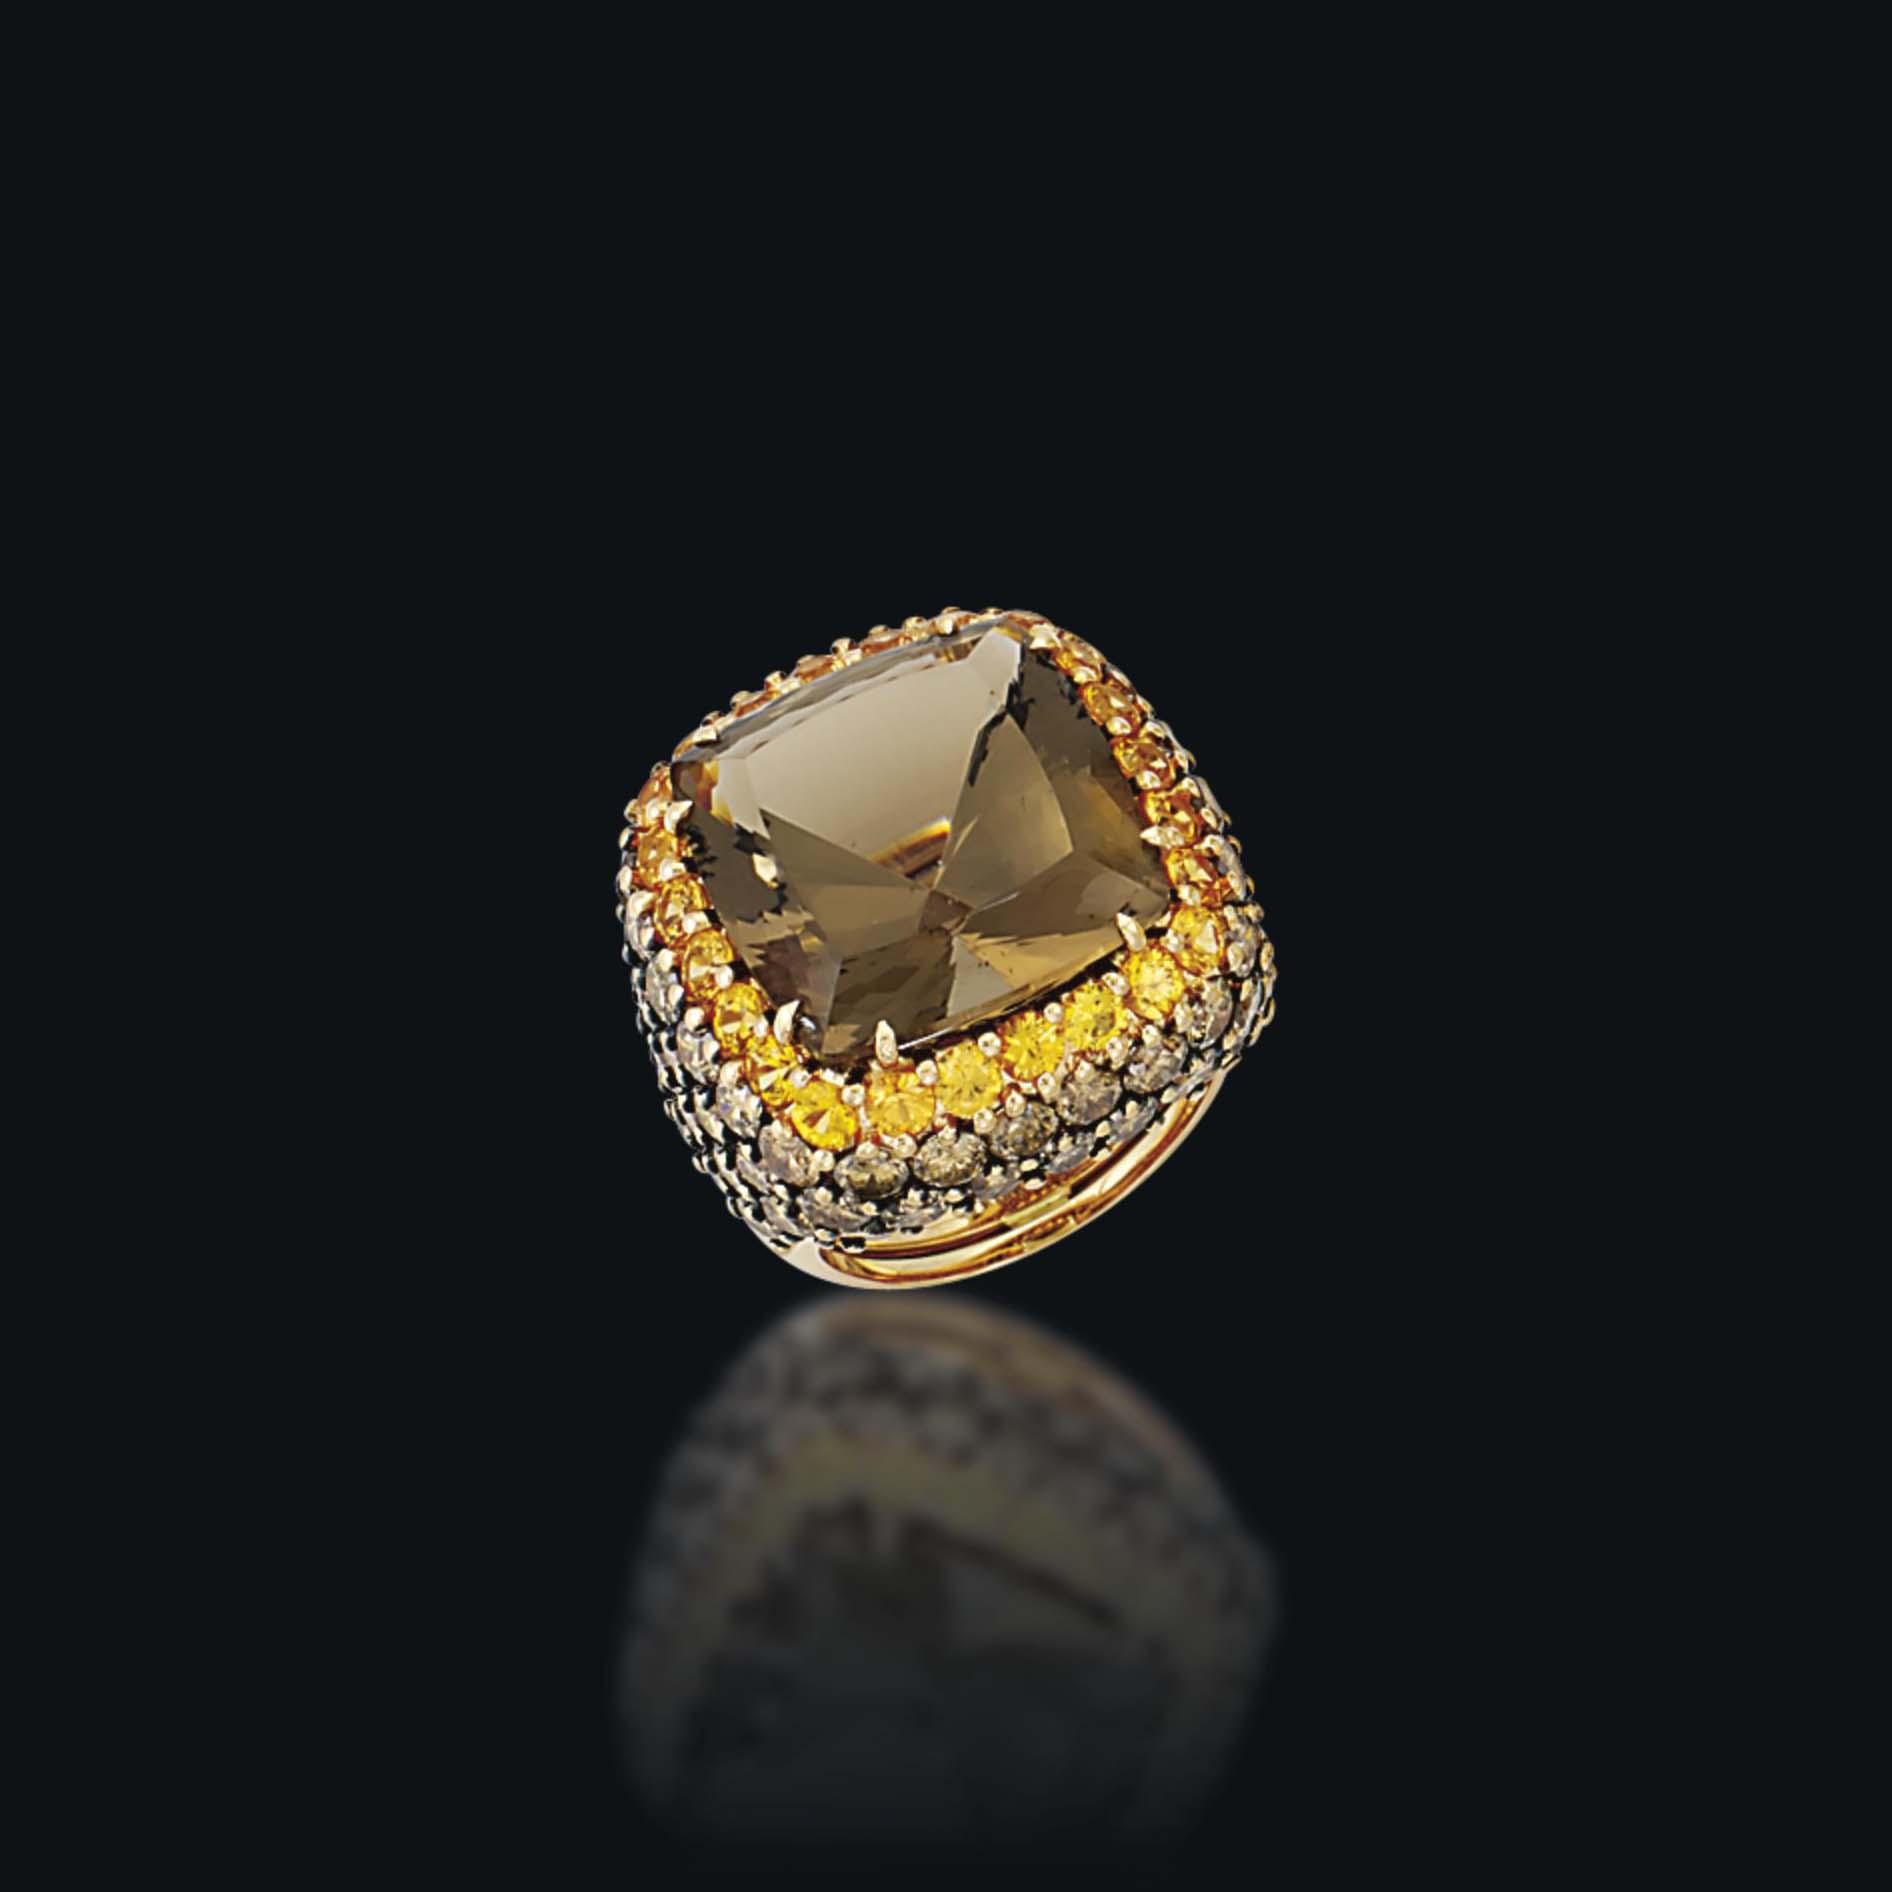 A SMOKEY QUARTZ, SAPPHIRE AND DIAMOND COCKTAIL RING, BY MARGHERITA BURGENER